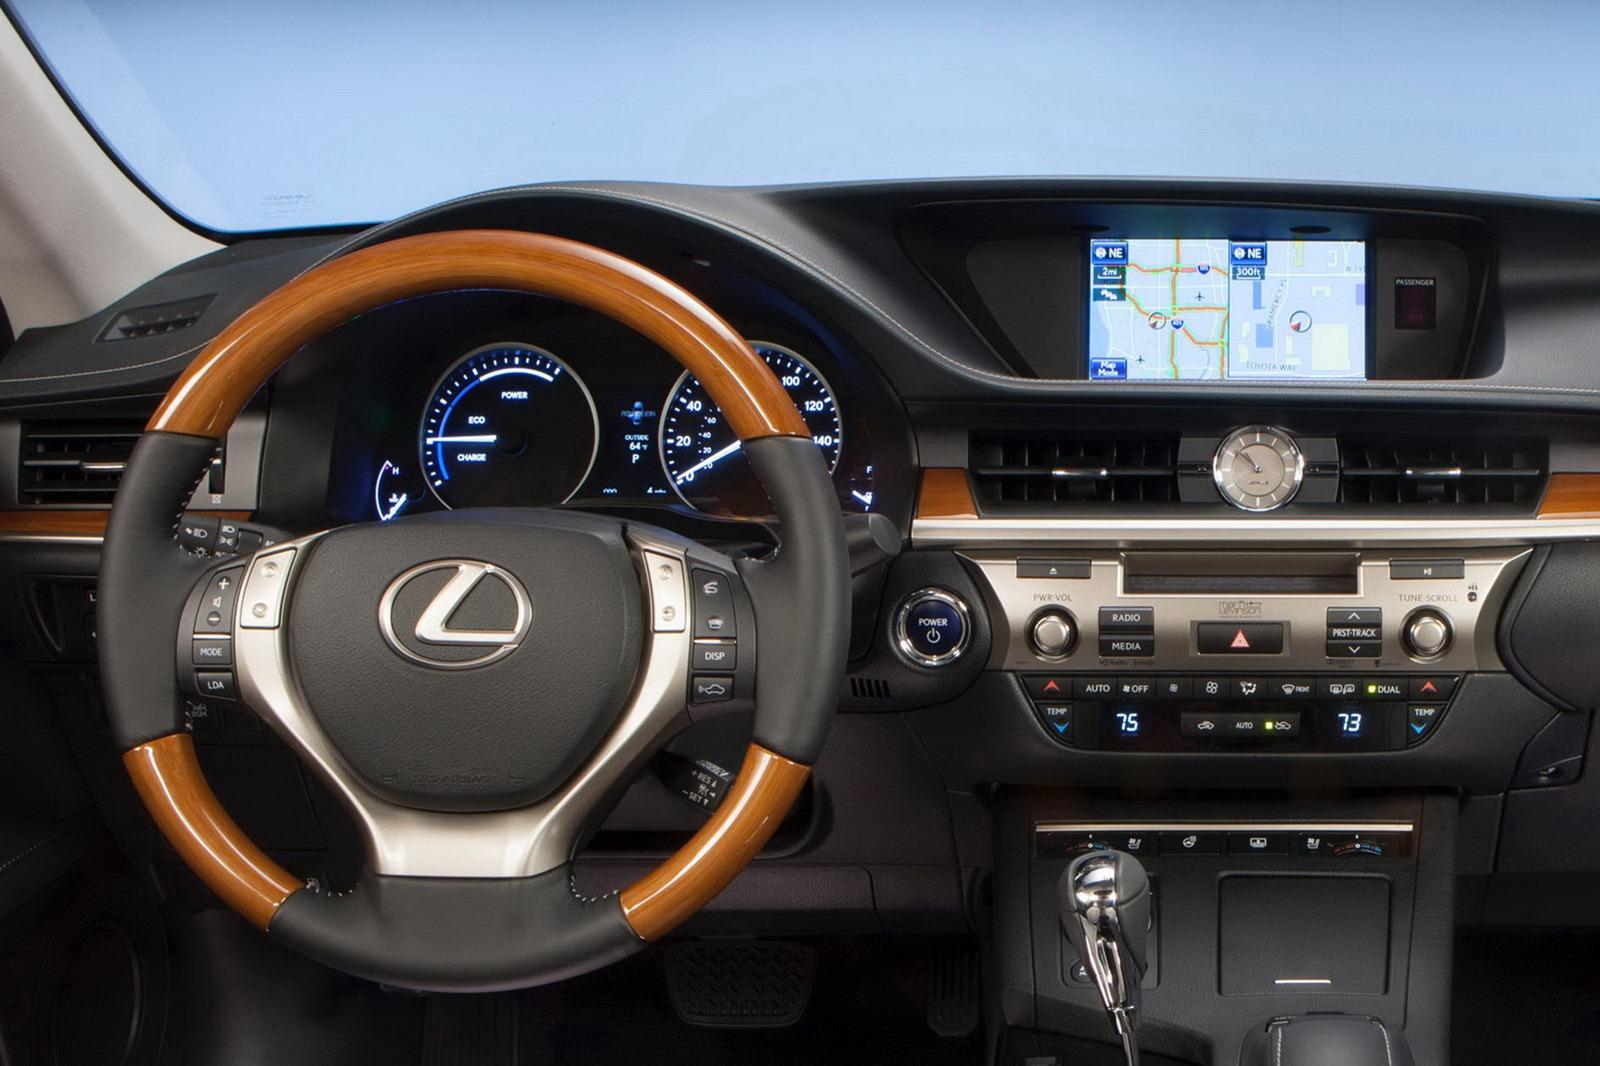 http://lh4.ggpht.com/-TXOLhpCQVIk/T3xwddr-fRI/AAAAAAAHPOk/4jdVd8lpxhg/s1600/2013-Lexus-ES-22%25255B2%25255D.jpg